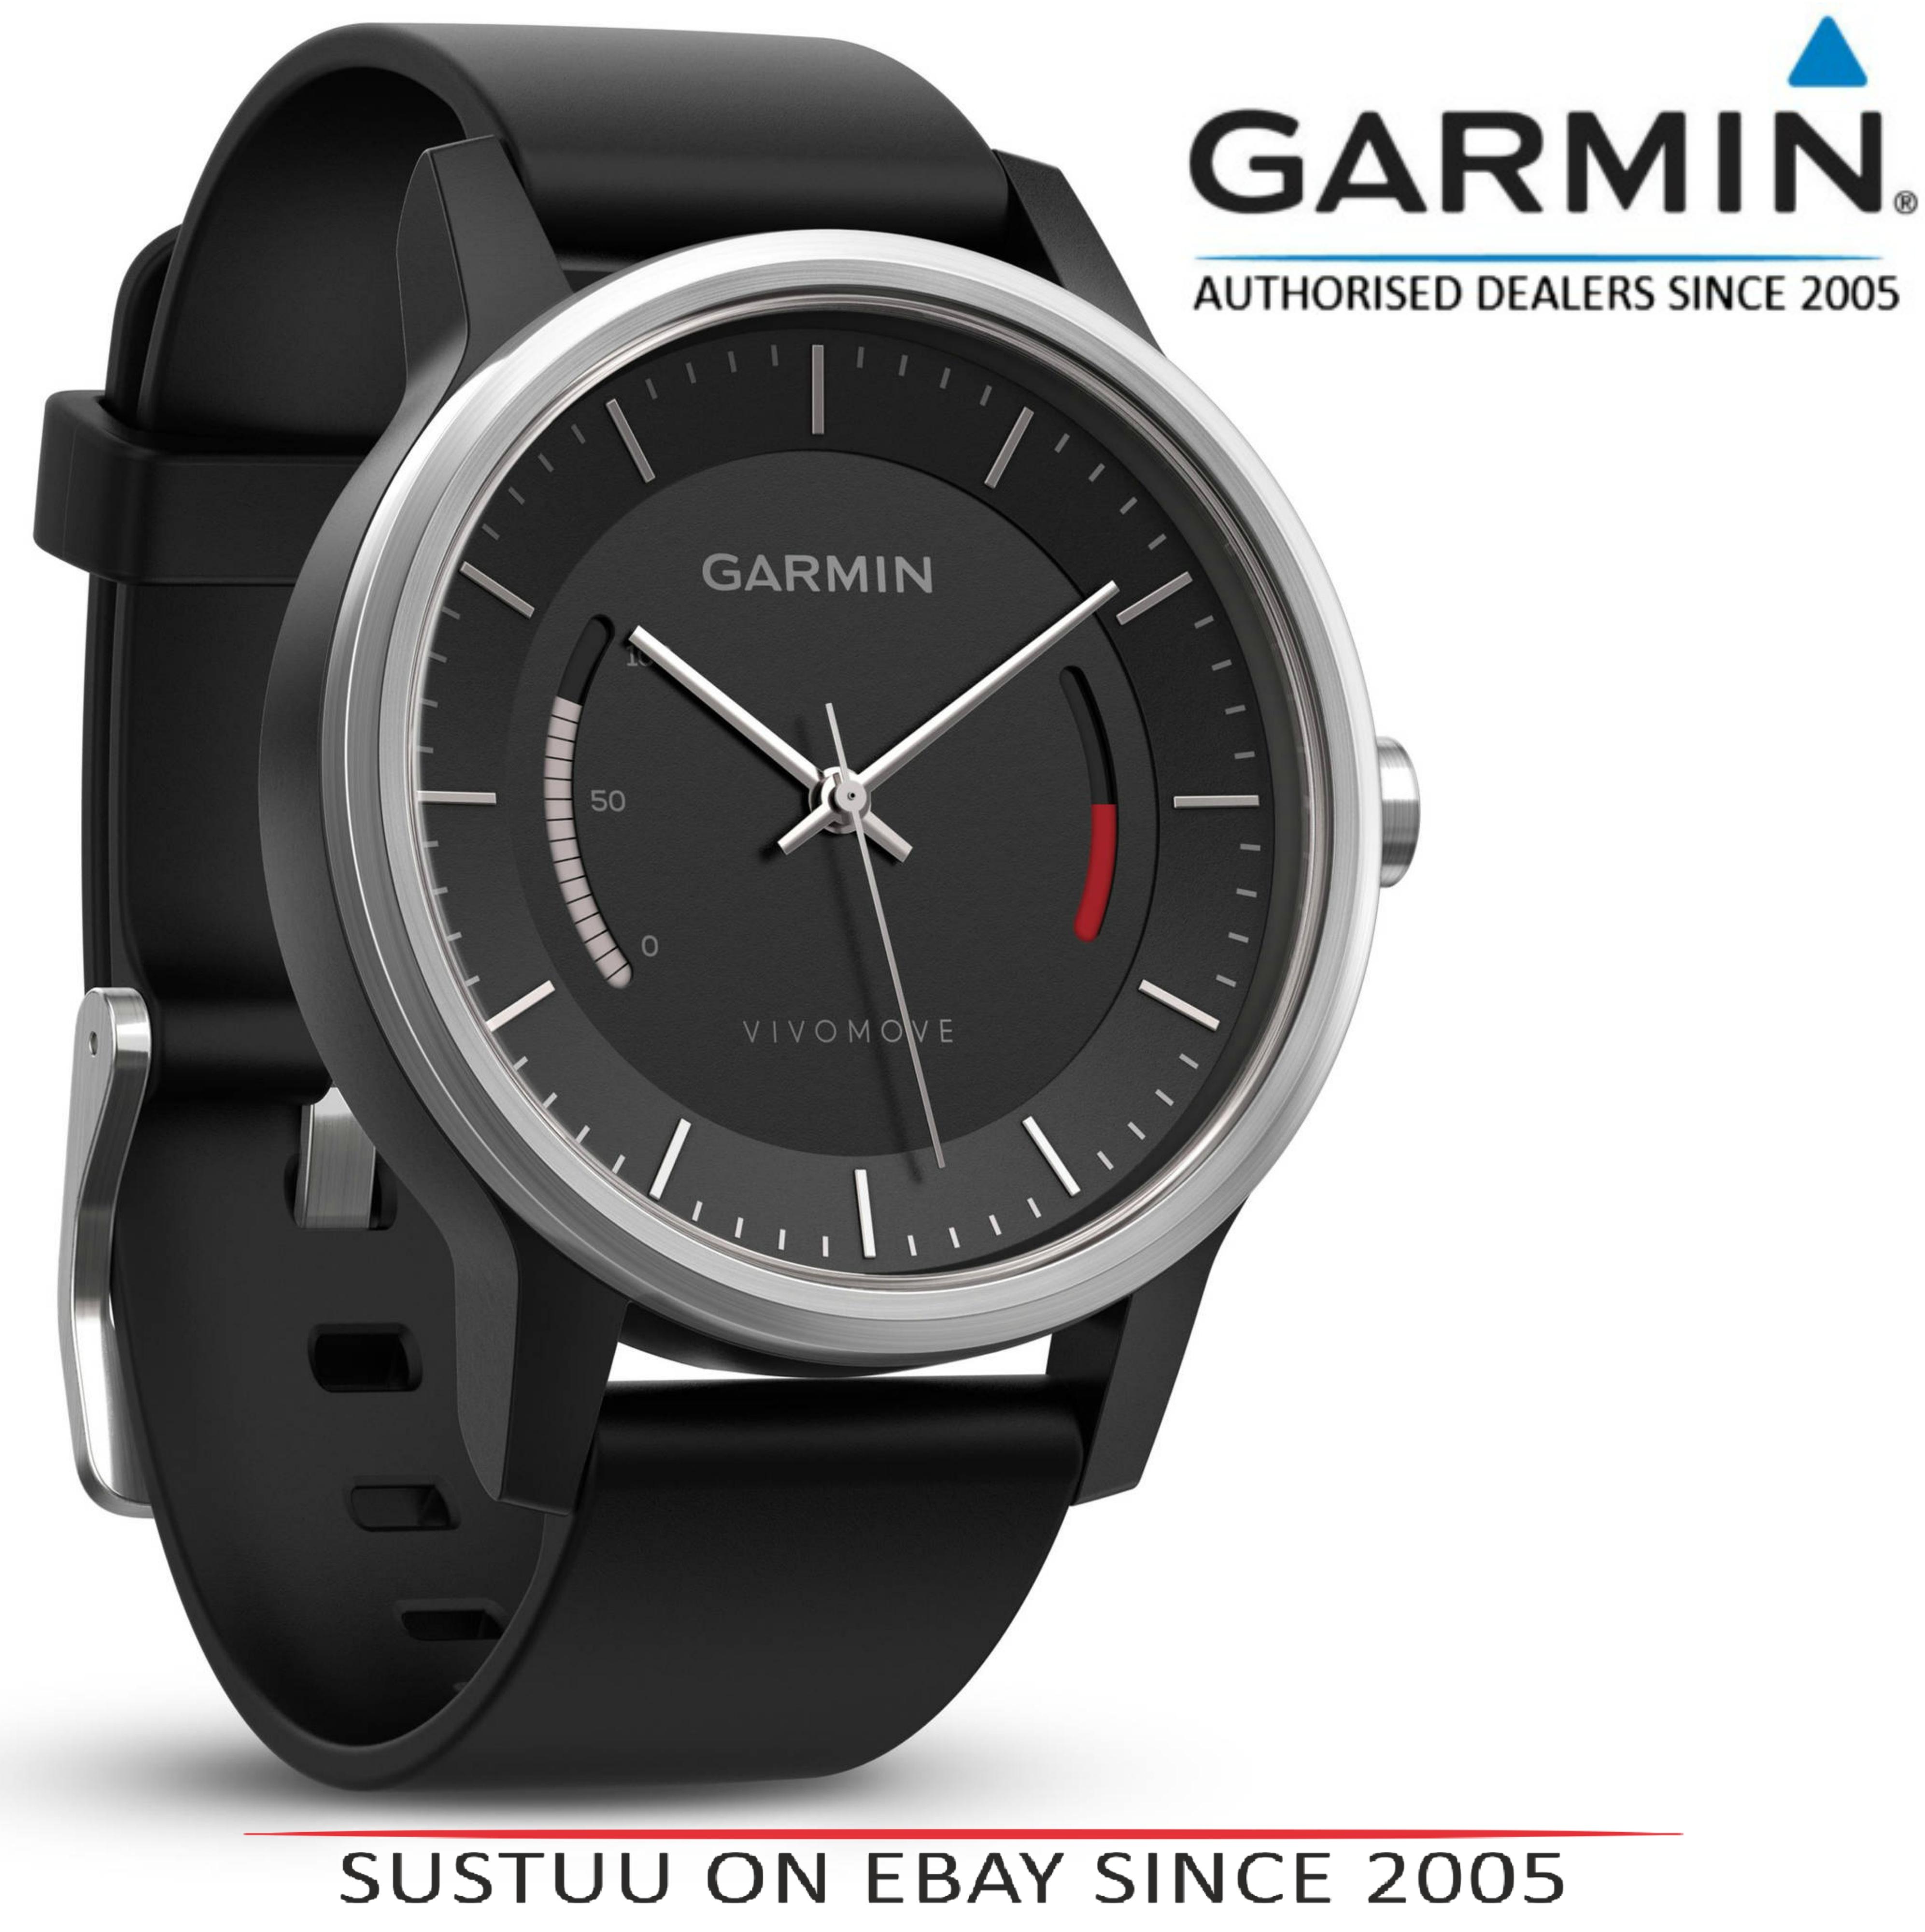 Garmin Vivomove|Analog Smart Unisex Watch|Activity Tracker|Sleep Monitor|Sports-Black